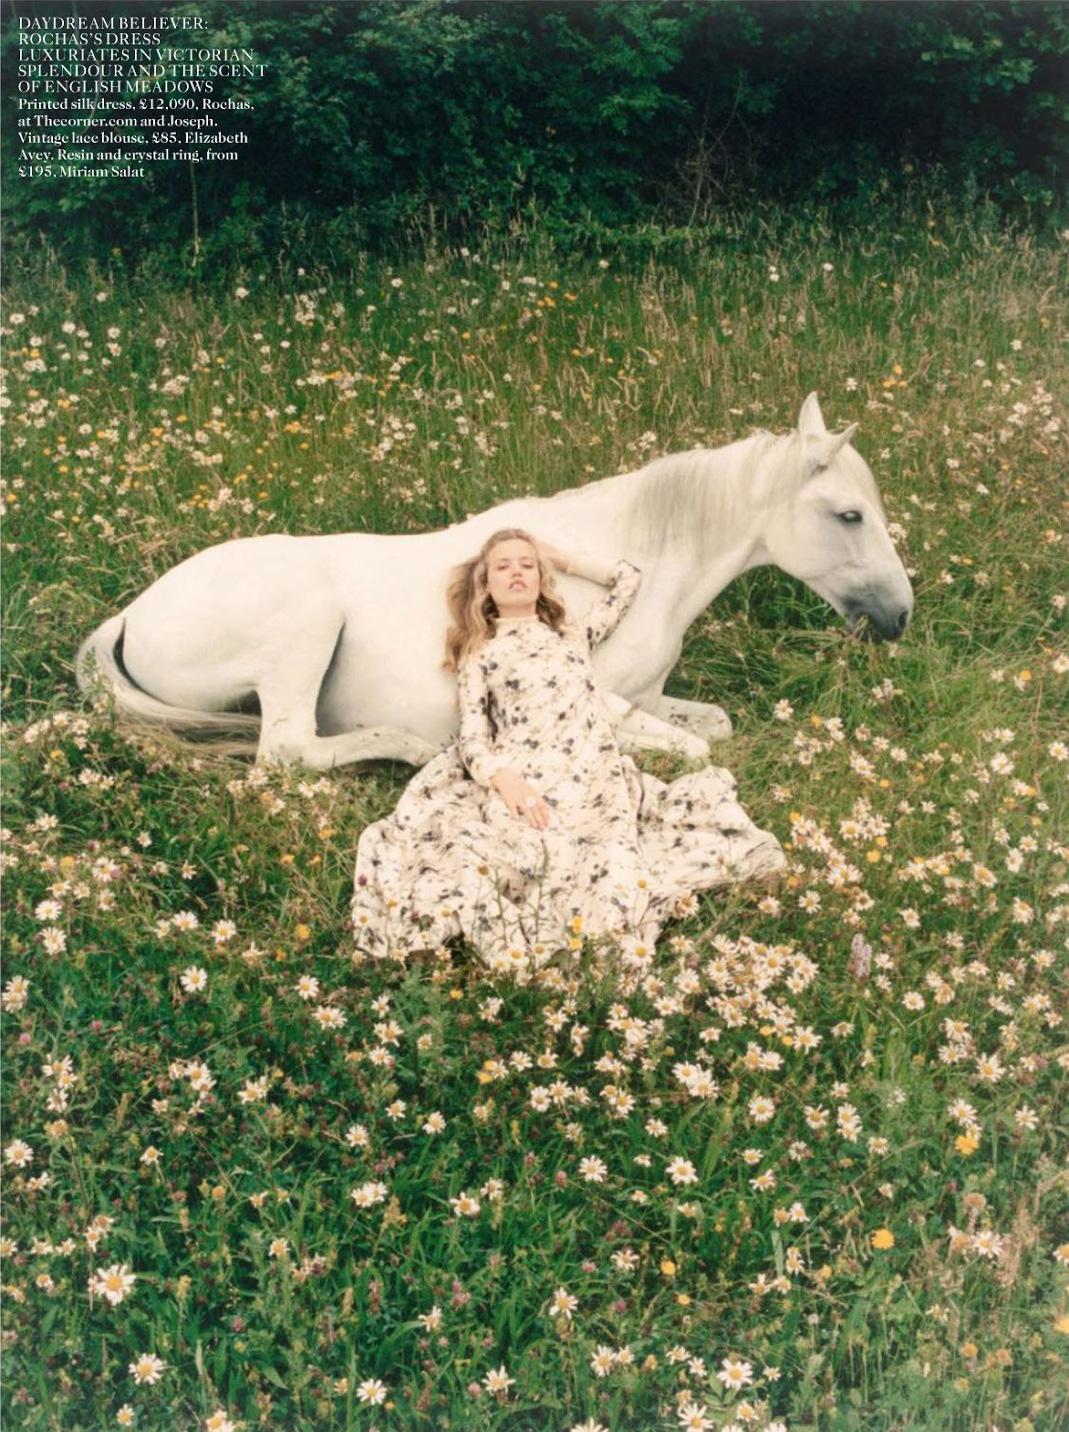 Dream-a-little-dream-Georgia-May-Jagger-by-Venetia-Scott-for-Vogue-UK-October-2013-7